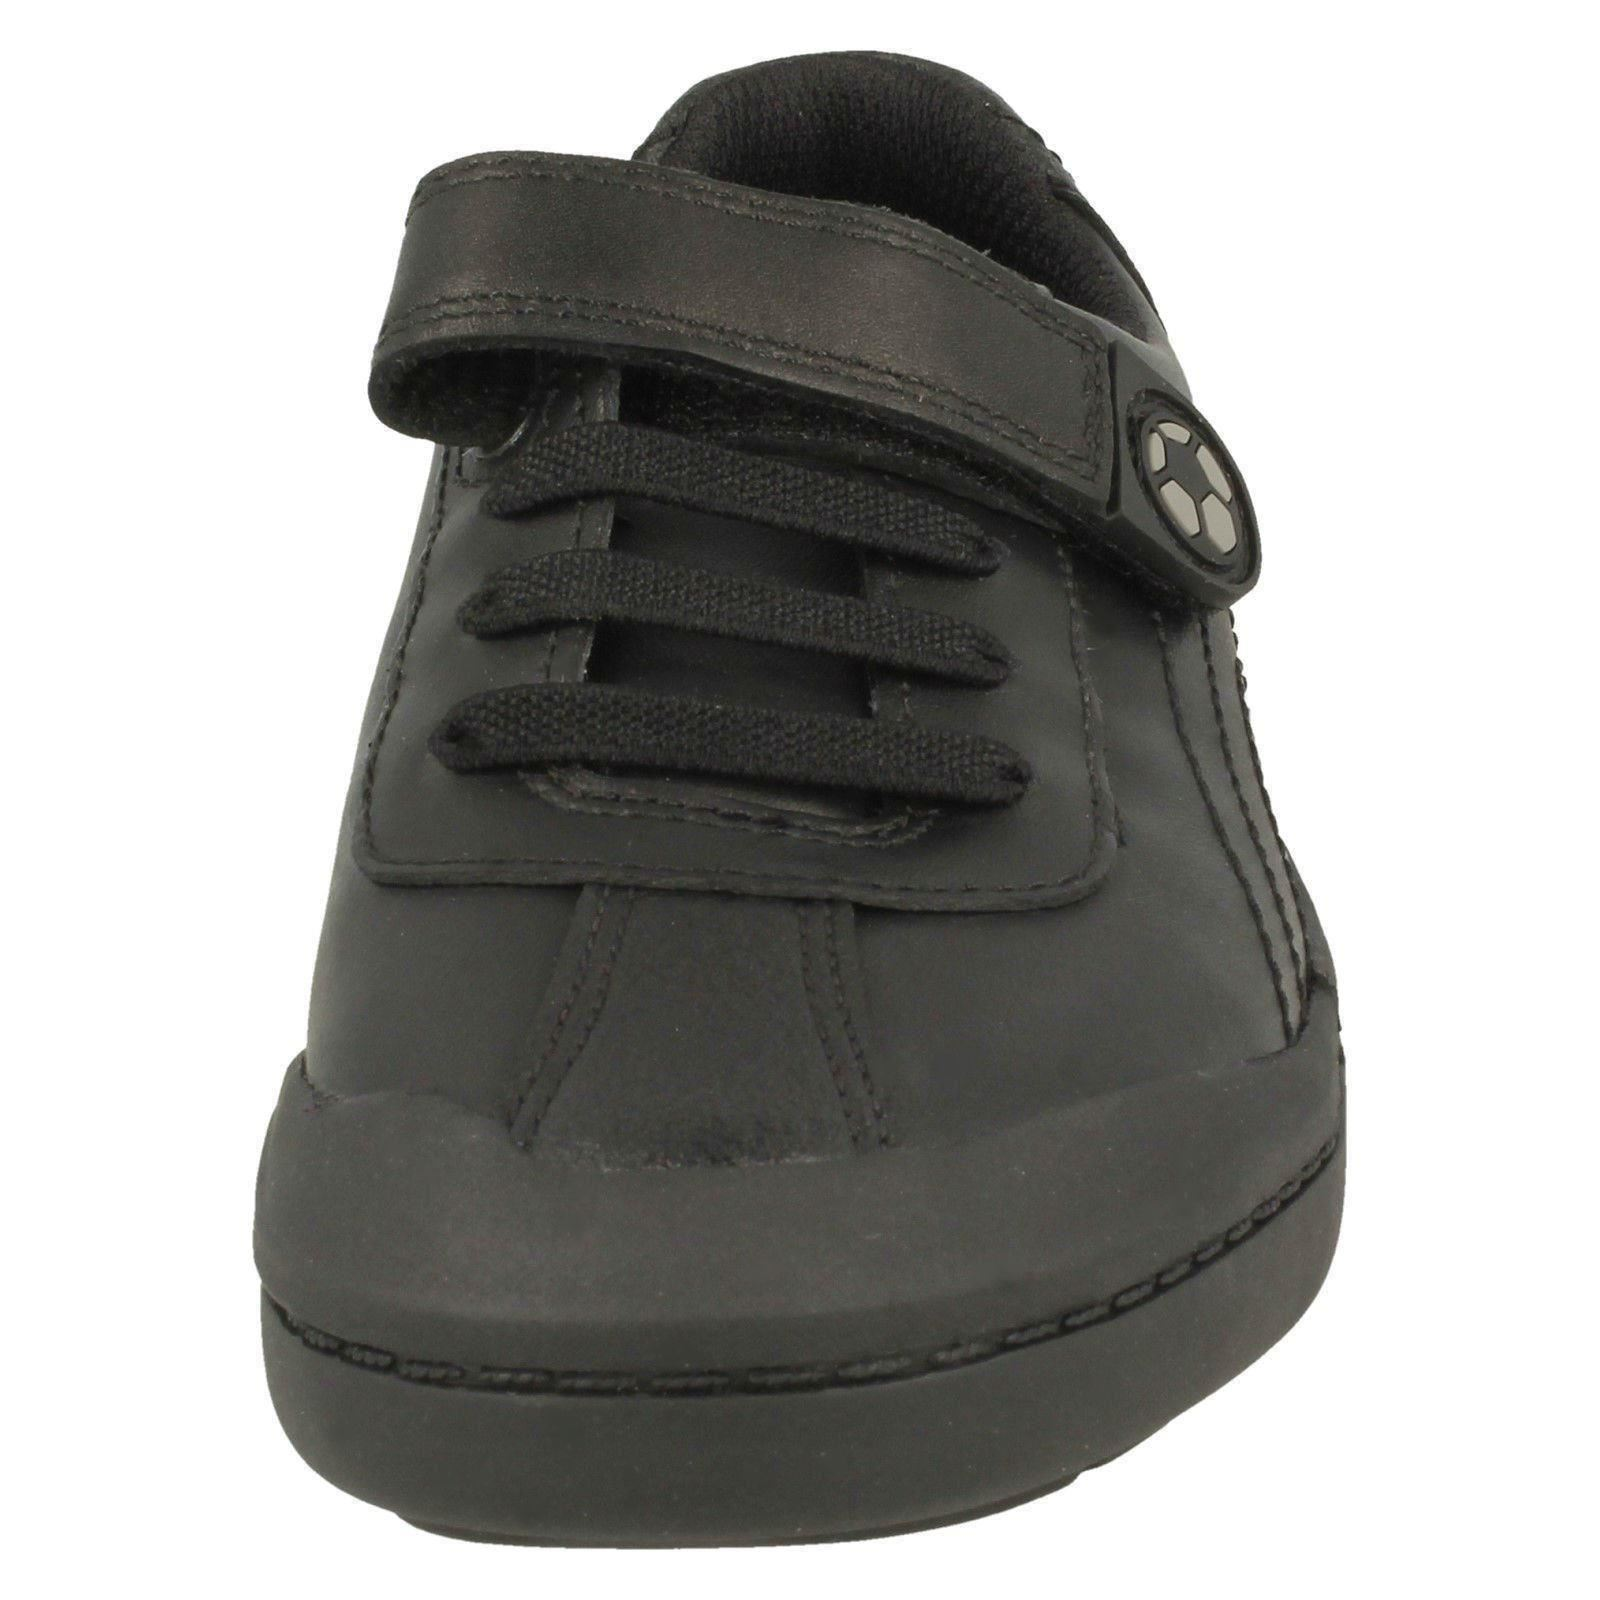 Clarks Boys Football Detailed School Shoes Rock Pass